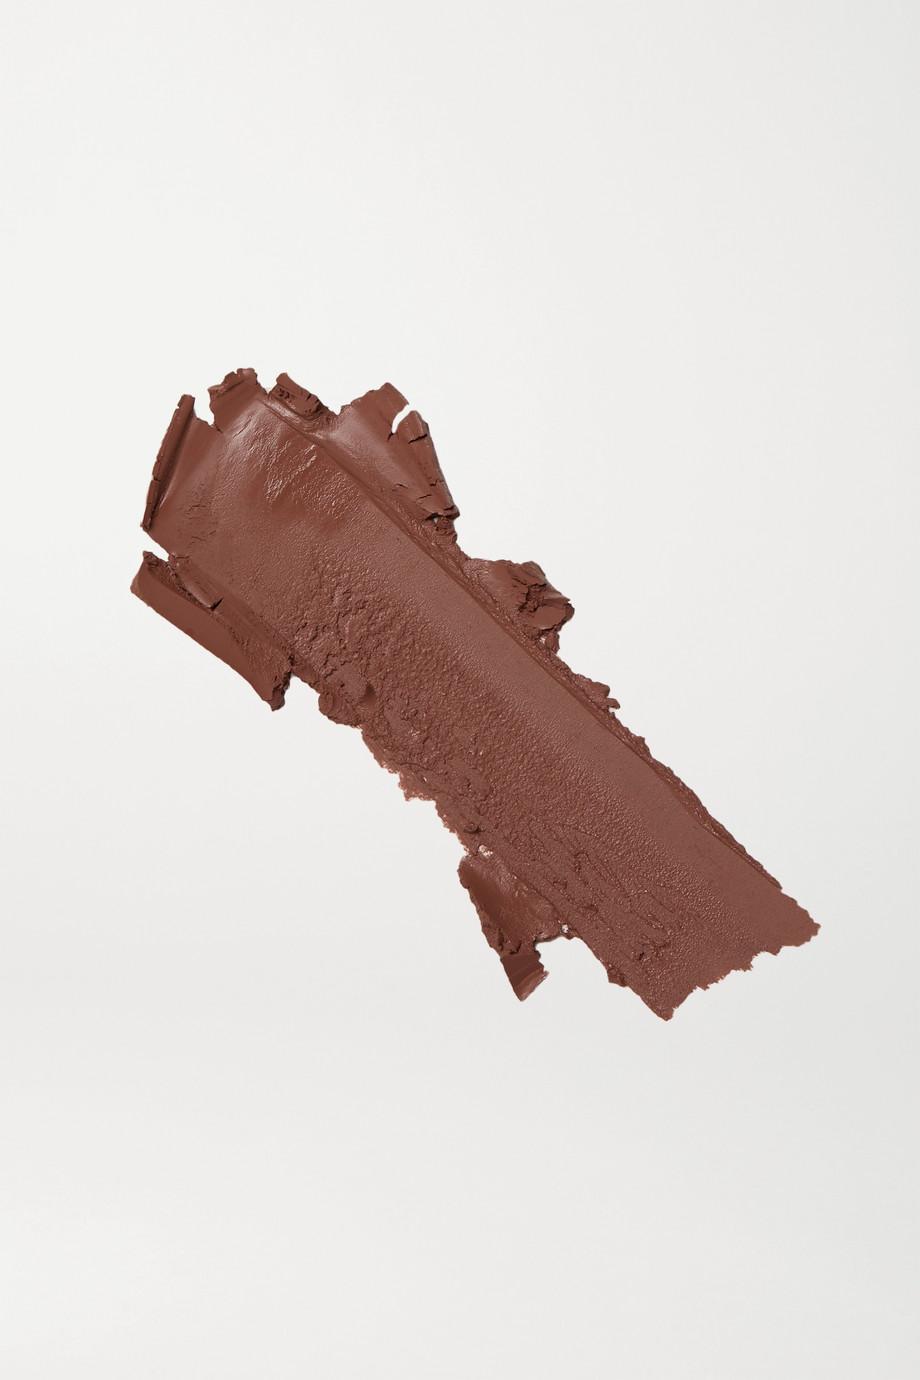 Kjaer Weis Cream Foundation Refill - Flawless